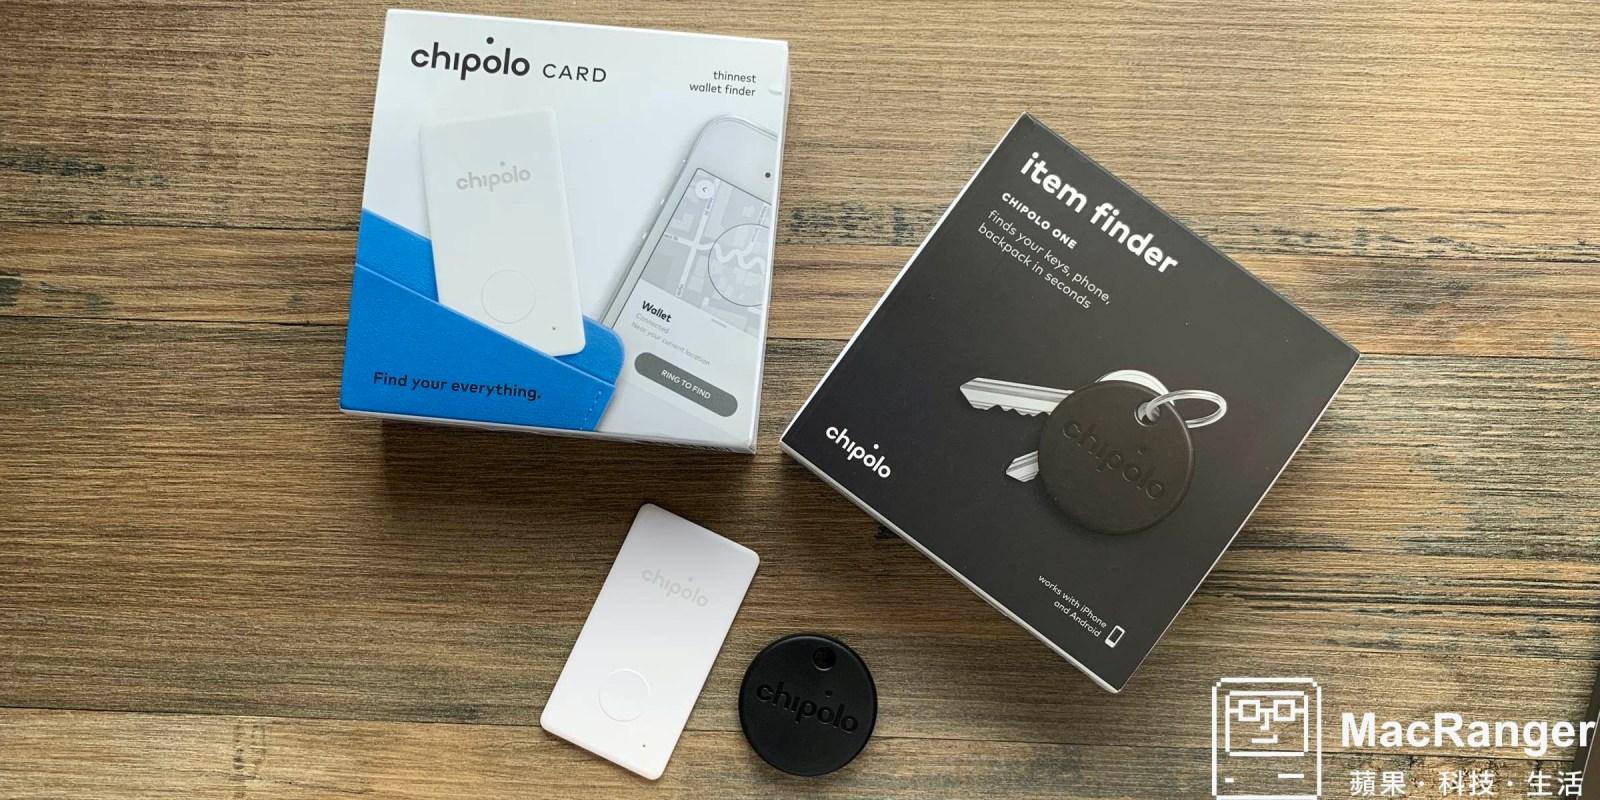 Chipolo 防丟器,用藍牙定位並發出響聲讓你快速找到